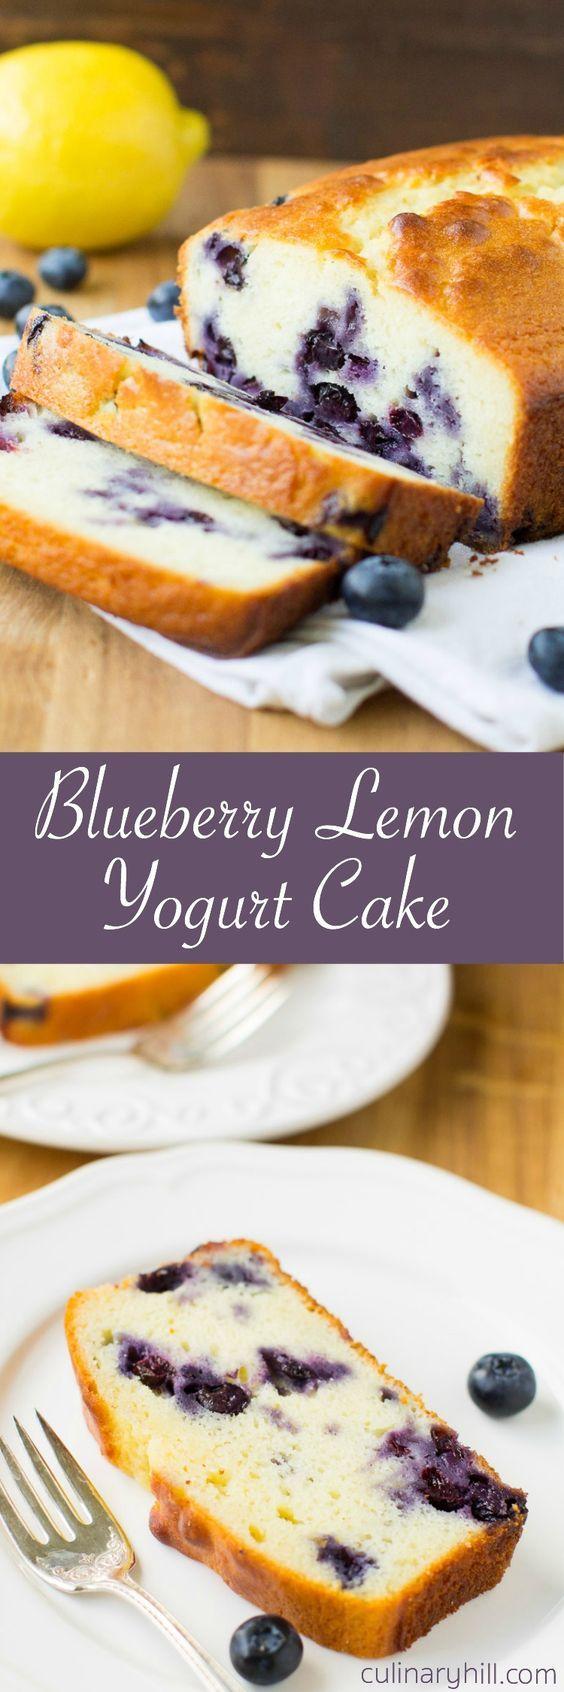 Blueberry Lemon Yogurt Cake